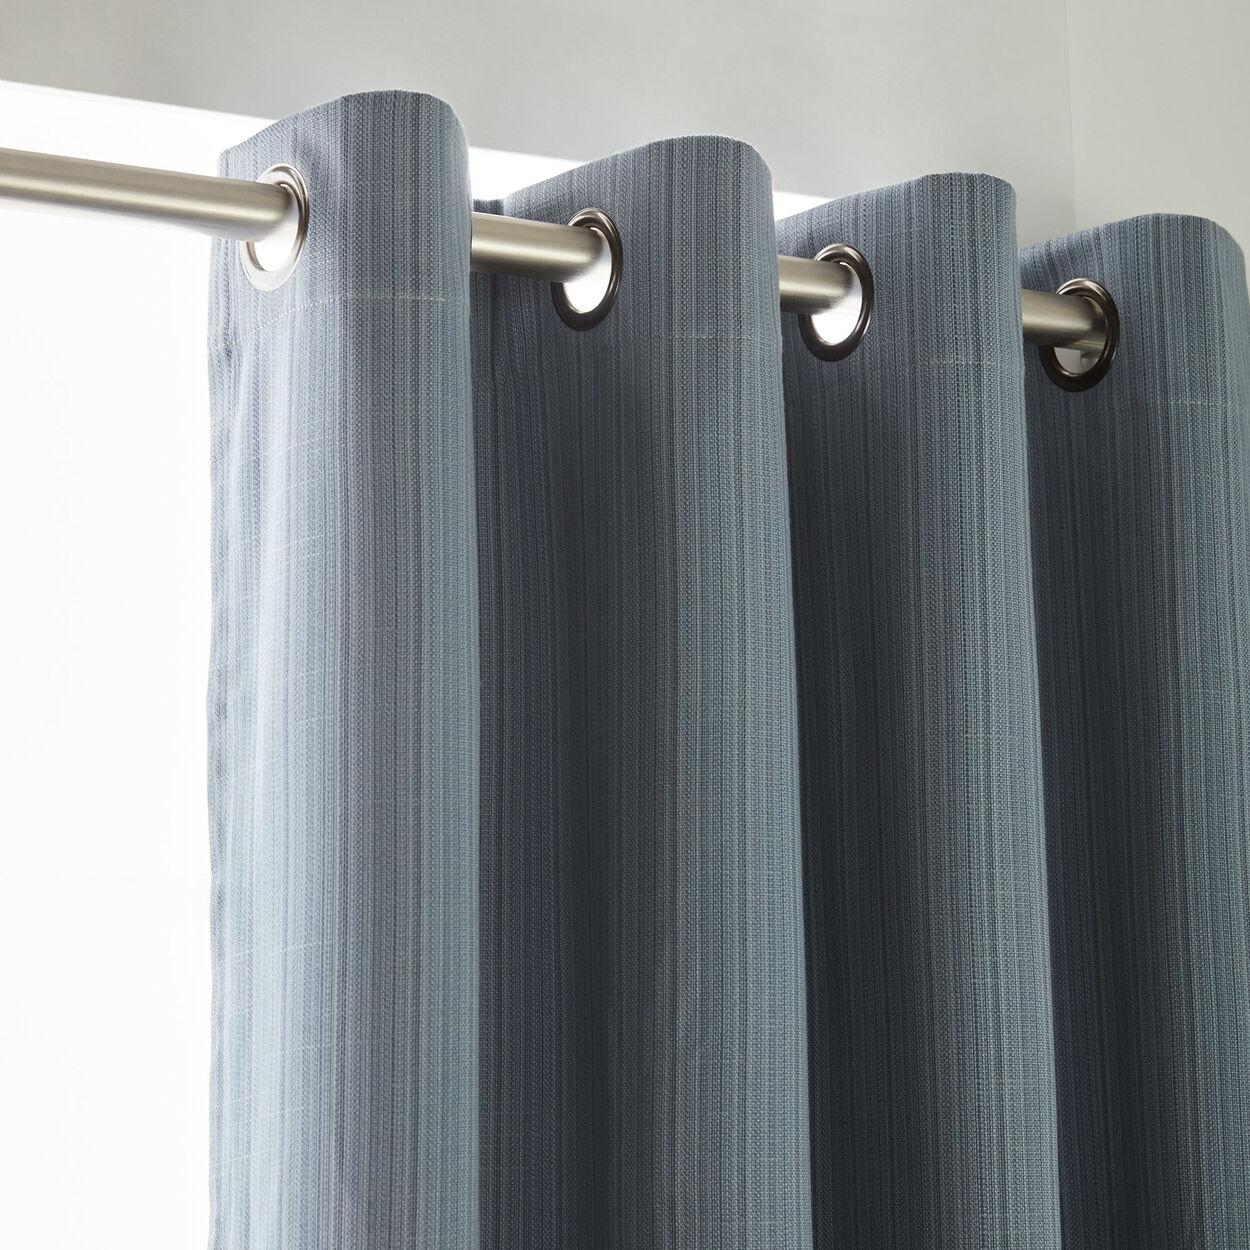 Kimia Blackout Curtain